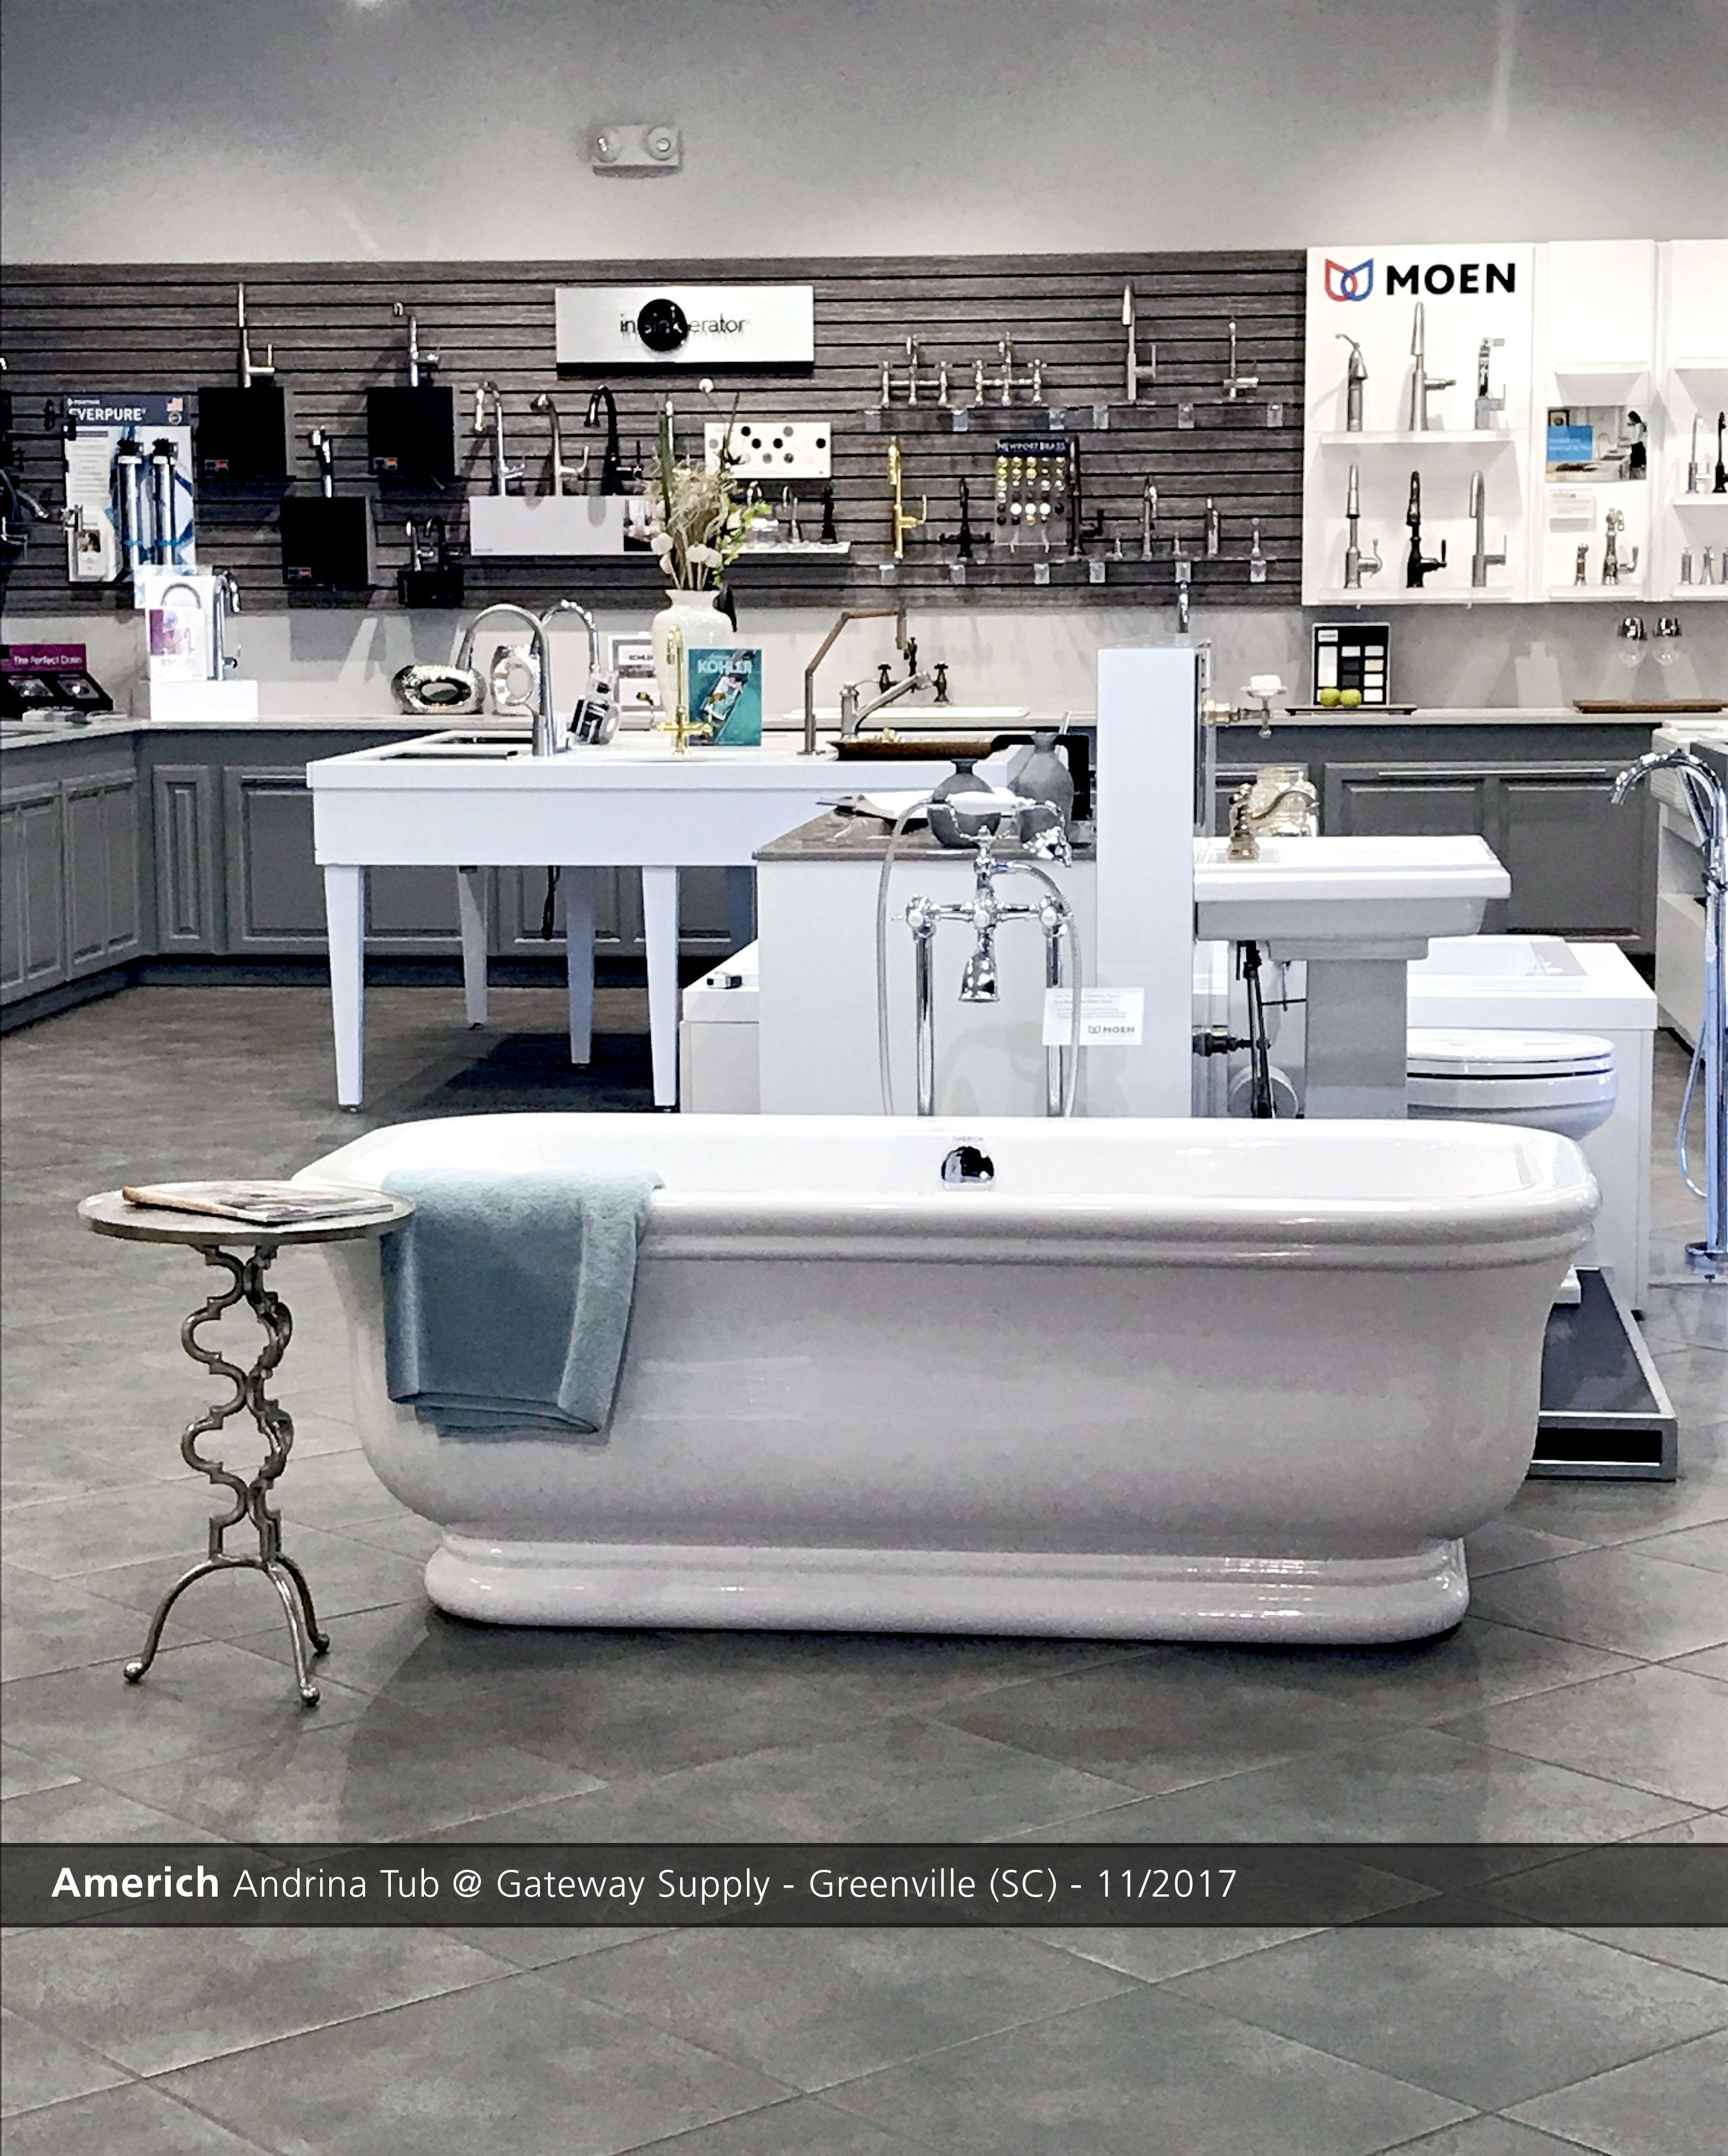 Coastal Plumbing Supply Kitchen Bath Showroom: Americh Andrina Tub @ Gateway Supply